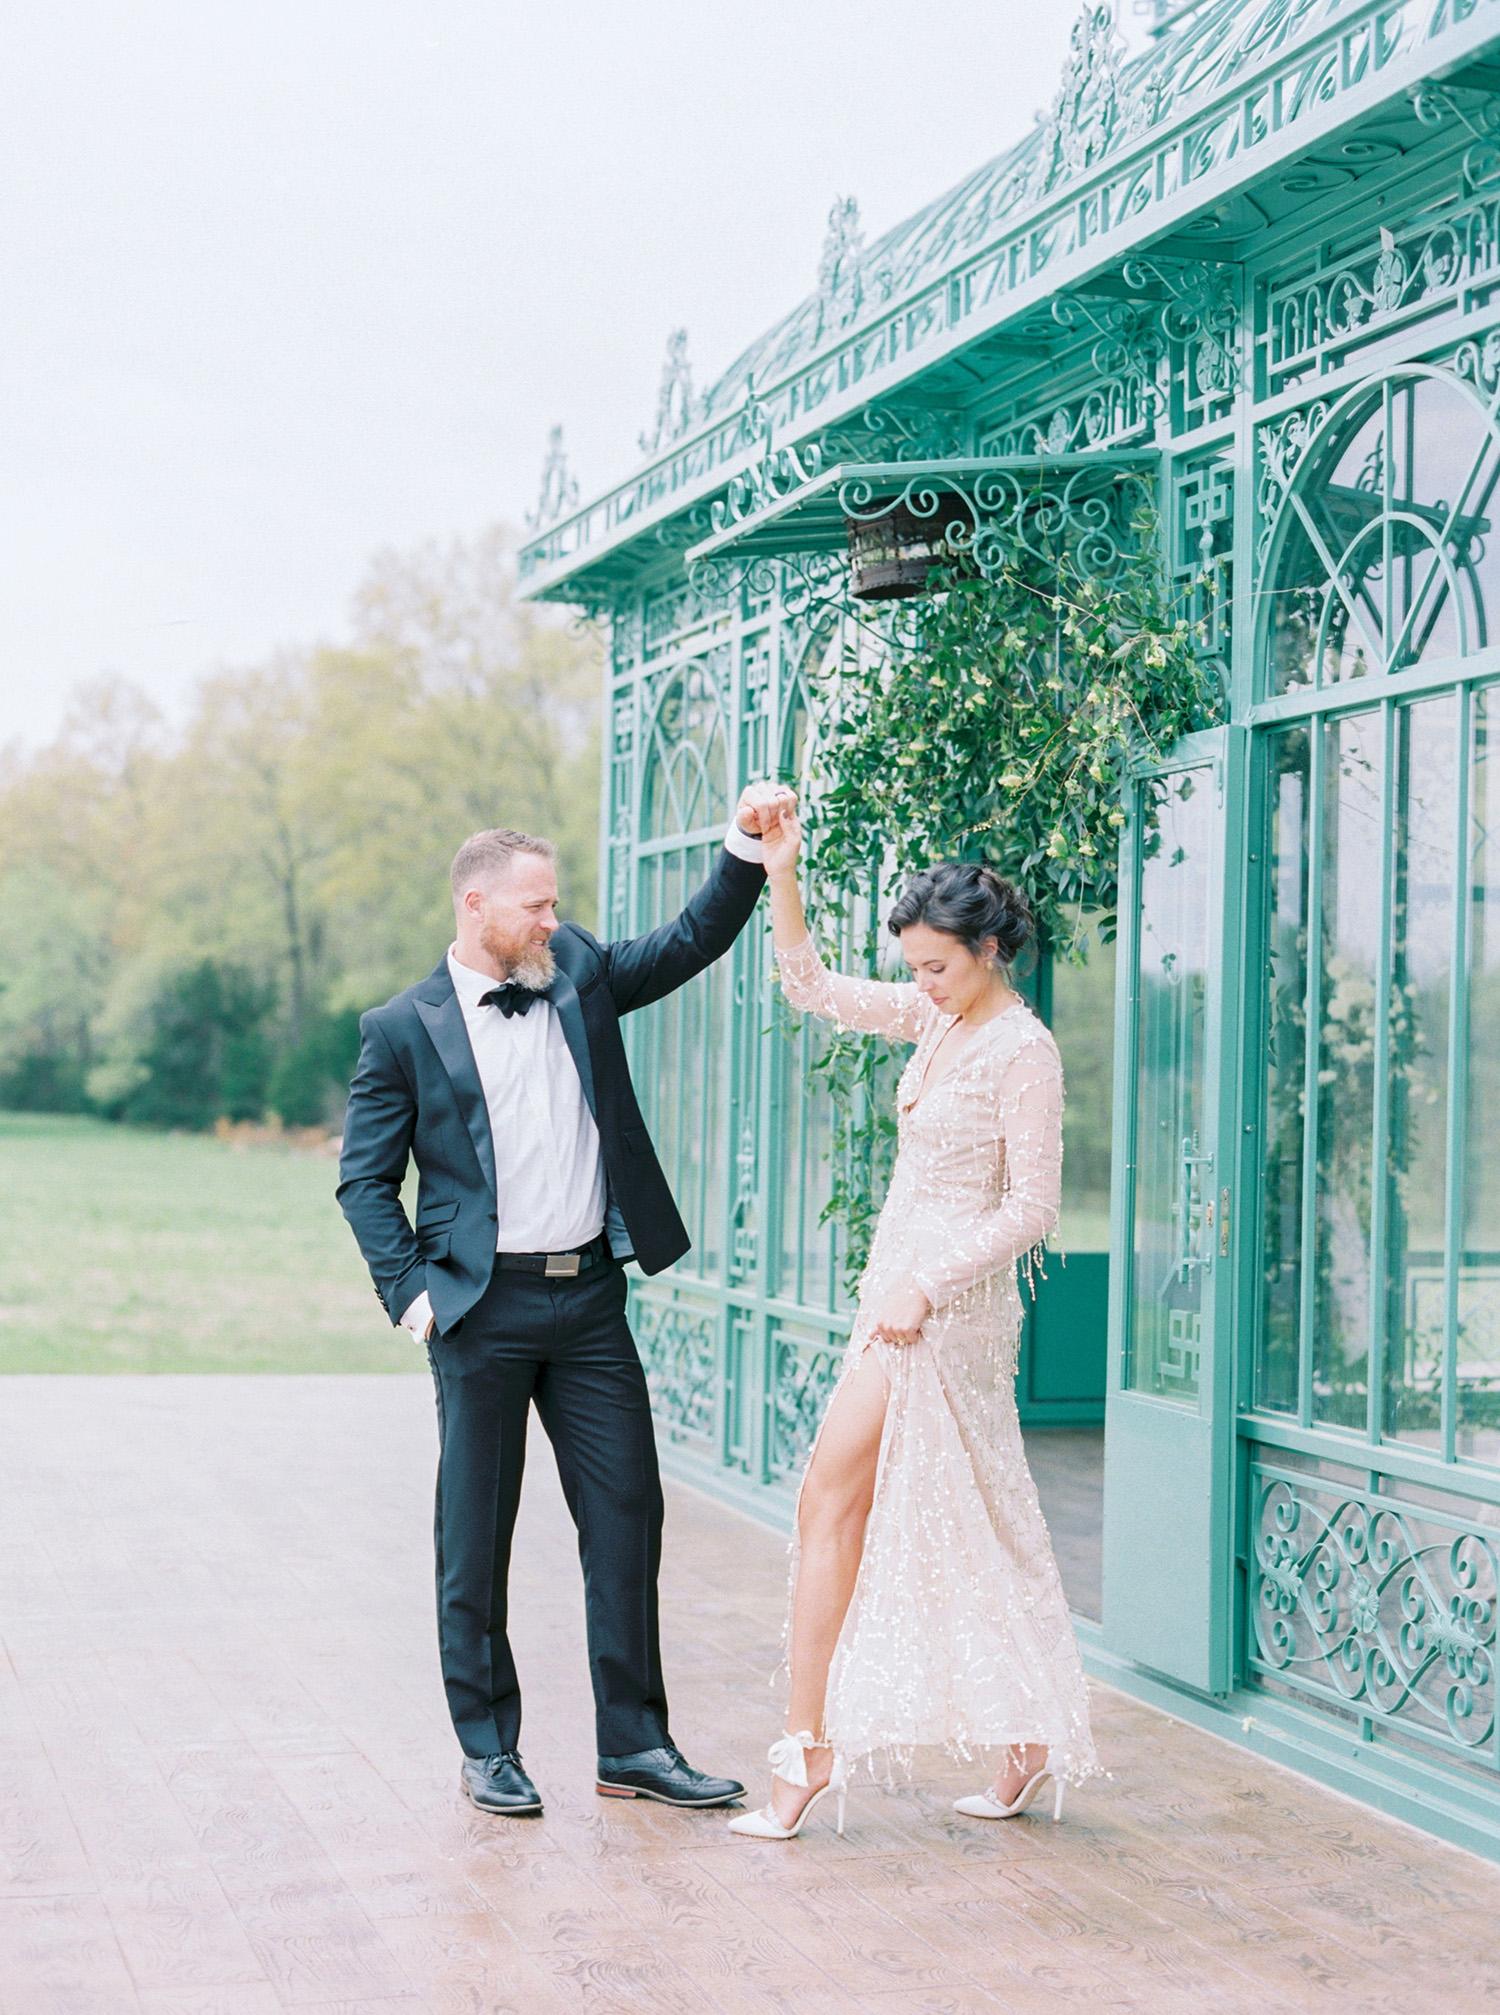 evan dustin vow renewal couple dancing